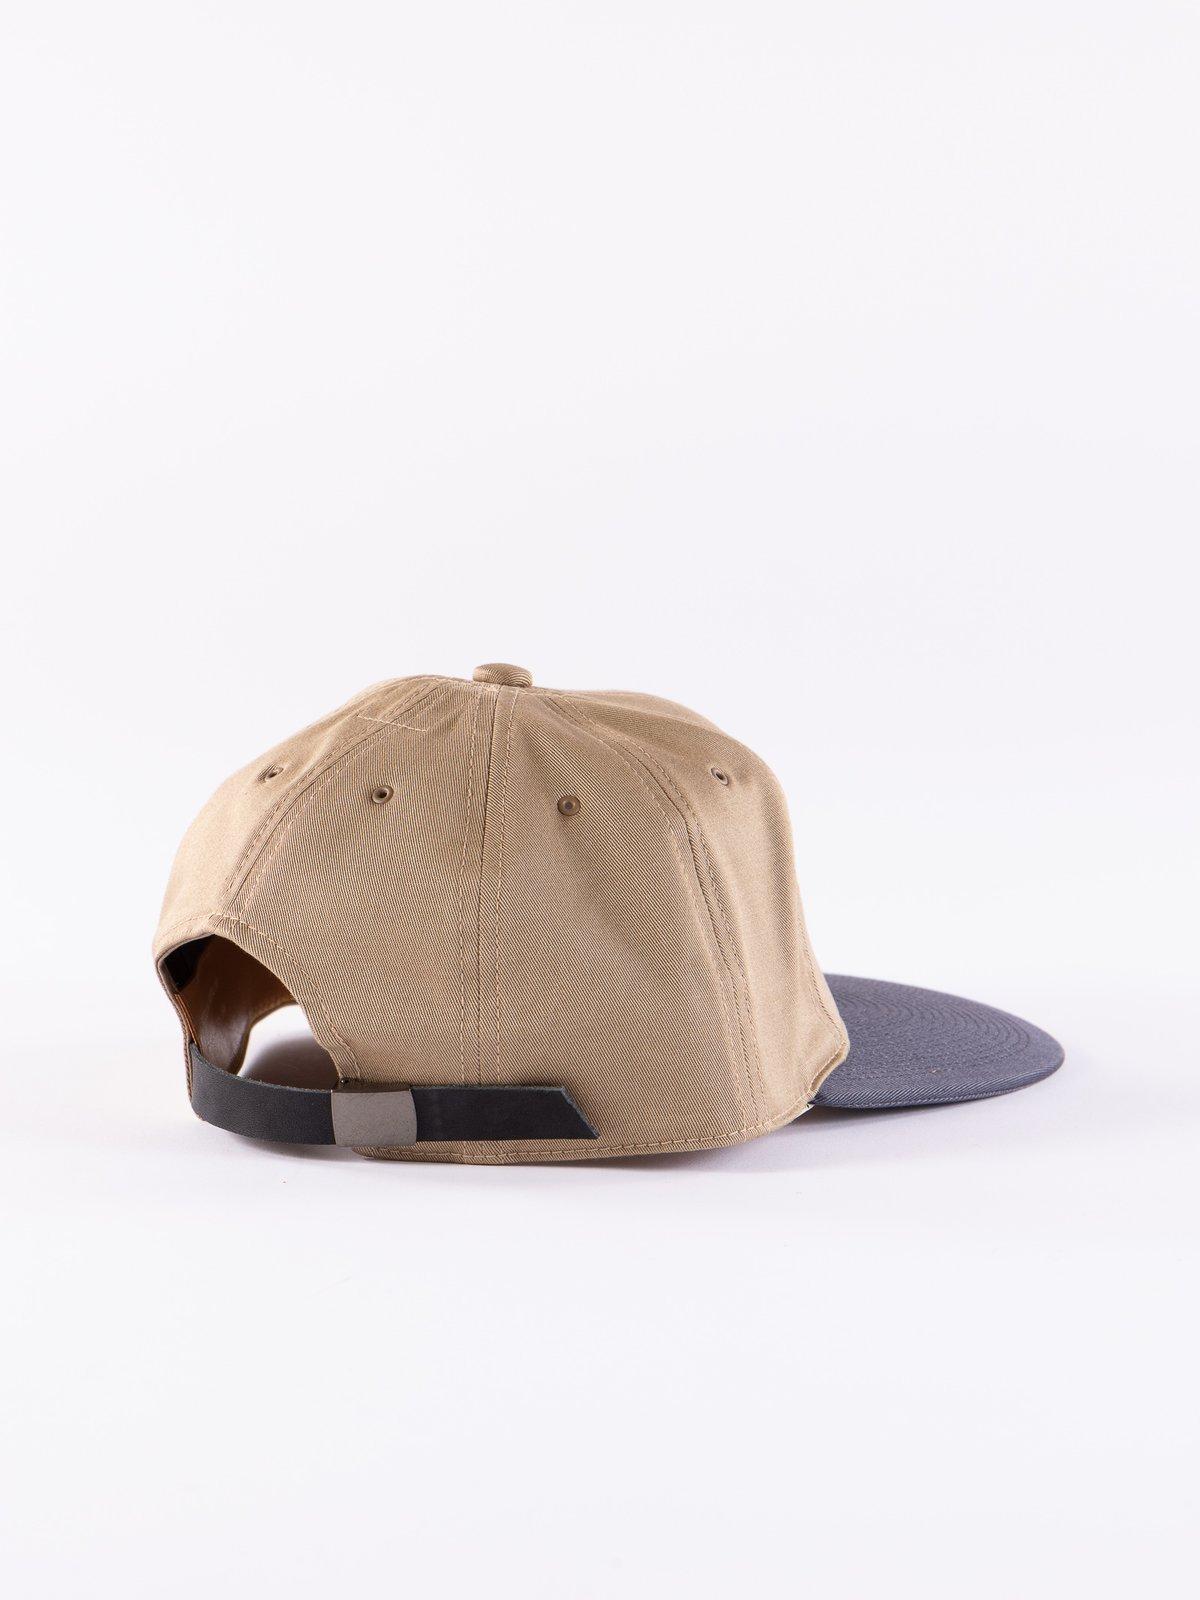 Beige/Black Chino Cap - Image 2